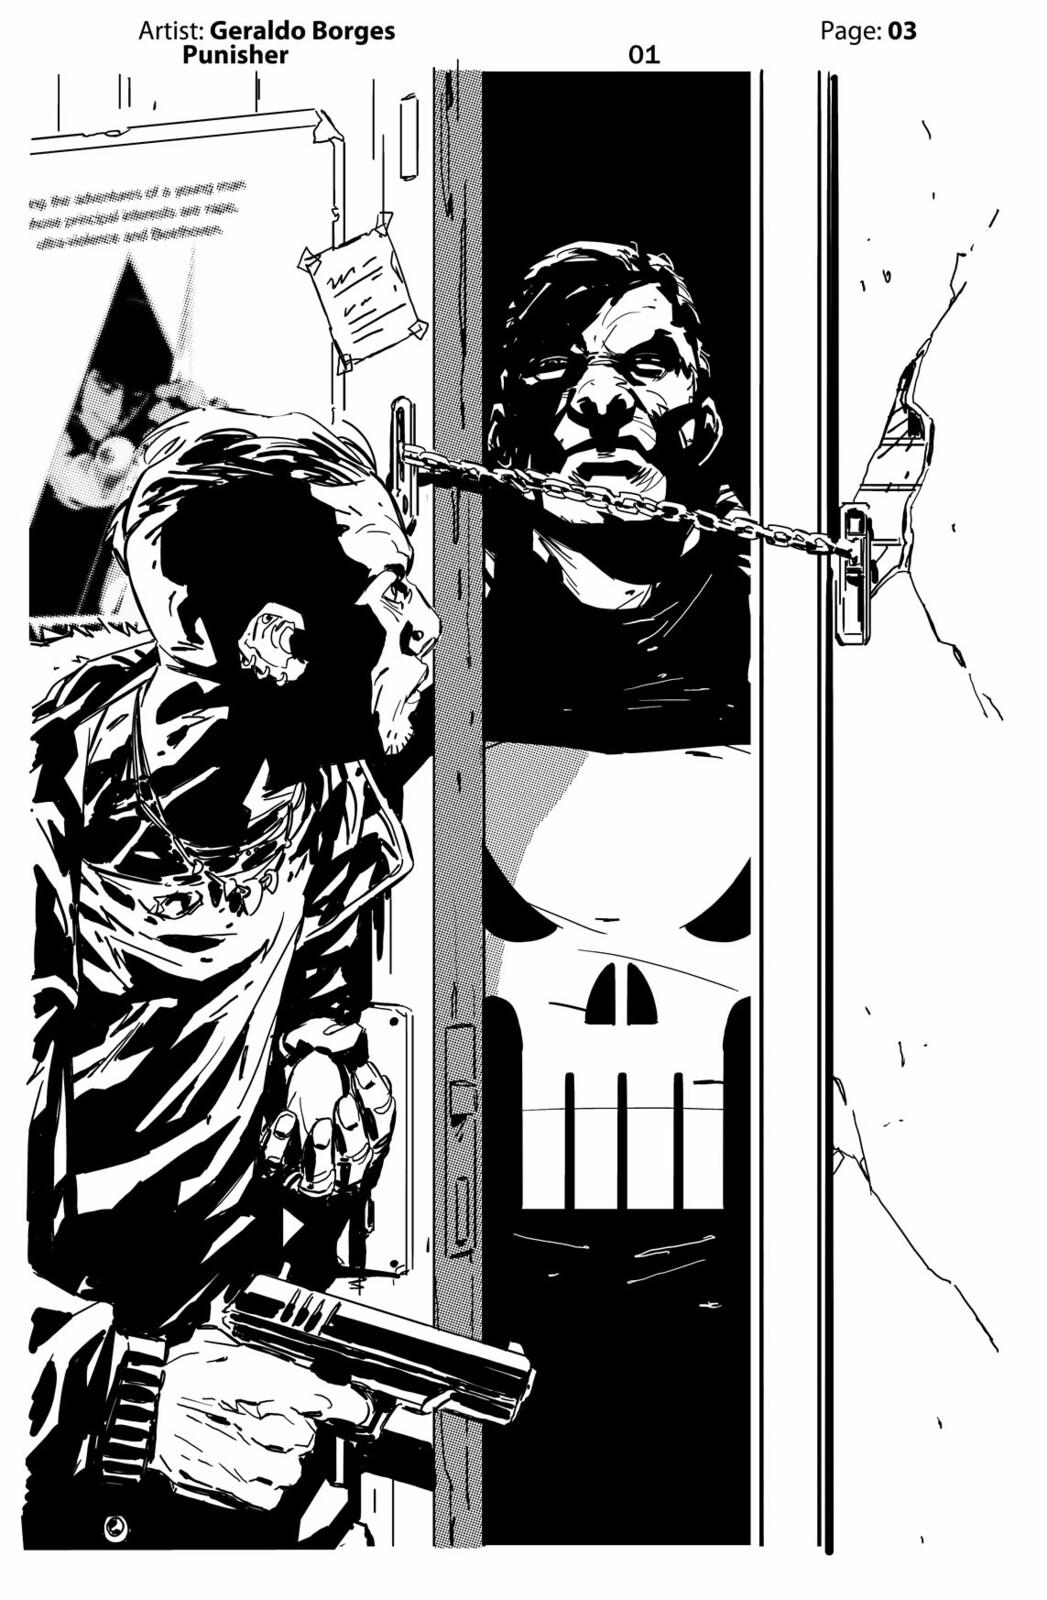 Geraldo Borges - Punisher Page 03